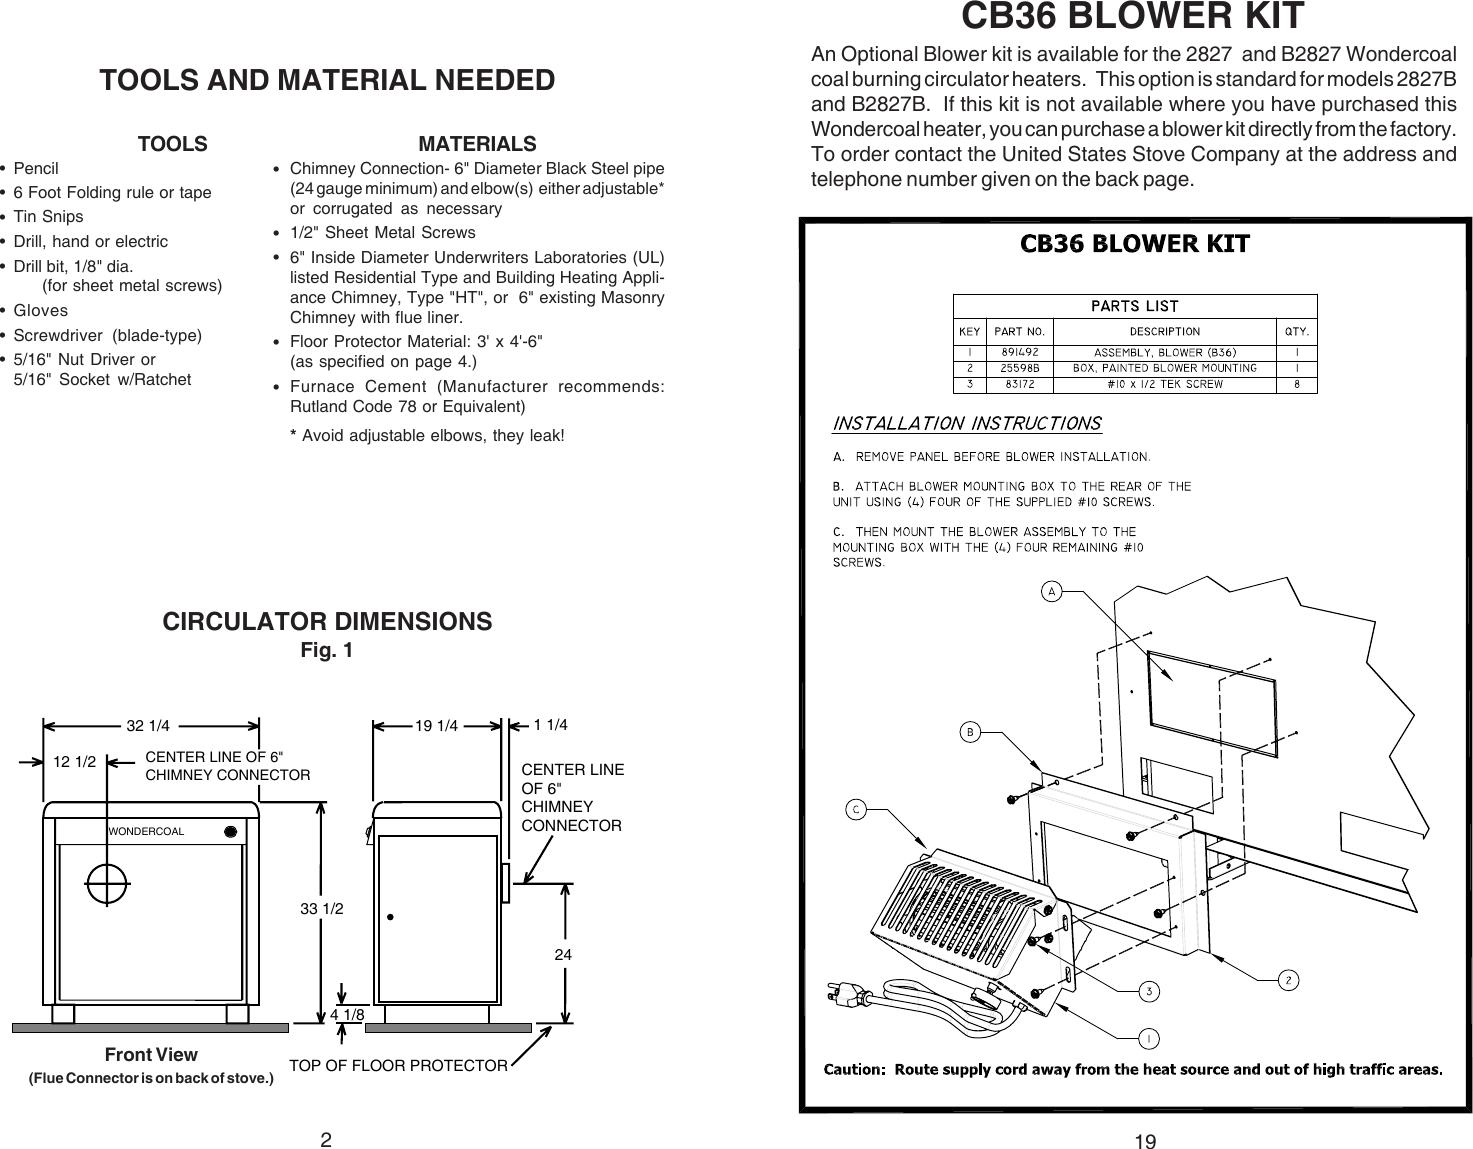 Ussc Wondercoal 2941 Owners Manual 1003456 85862jpmd User Coal Furnace Blower Wiring Diagram